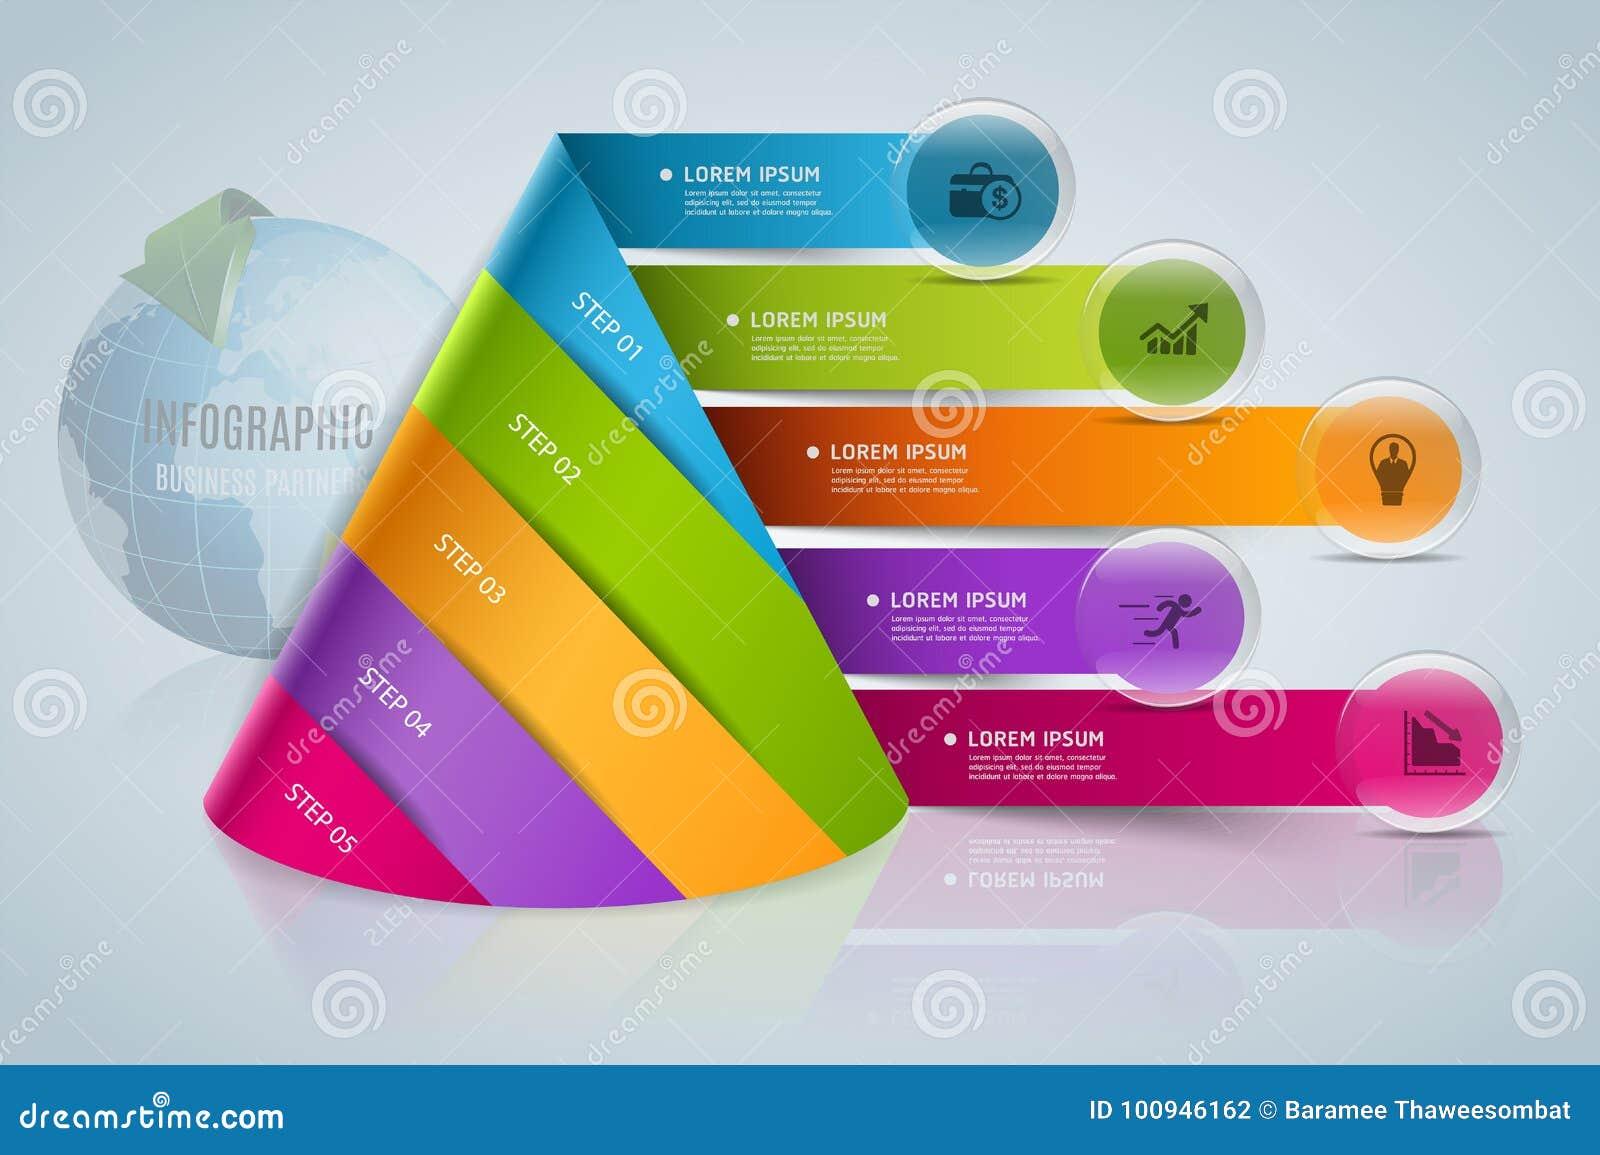 Infographics digital moderno abstrato da bandeira do vetor do molde